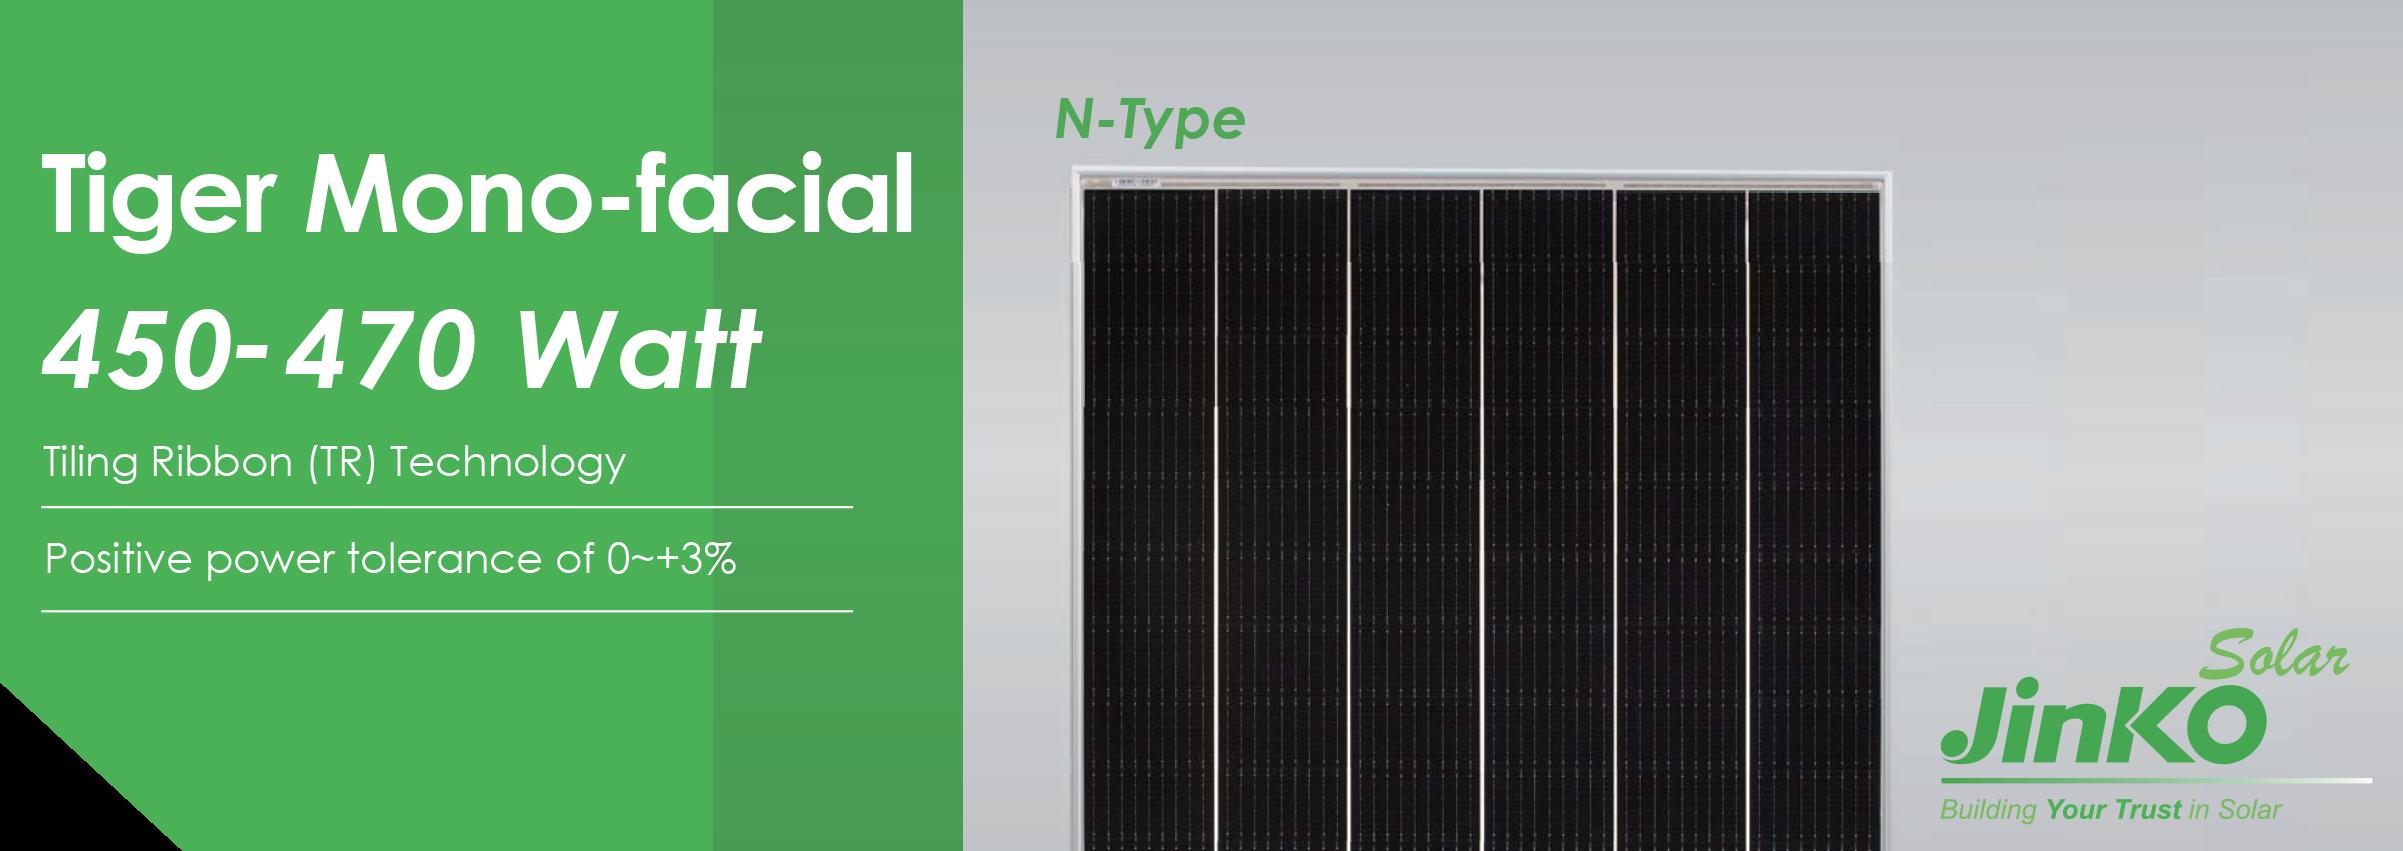 JinkoSolar Tiger Monofacial BiFacial 450-470 Watt Tiling Ribbon Technology Solar Panels Double the Electricity Missouri Illinois Solar Sam